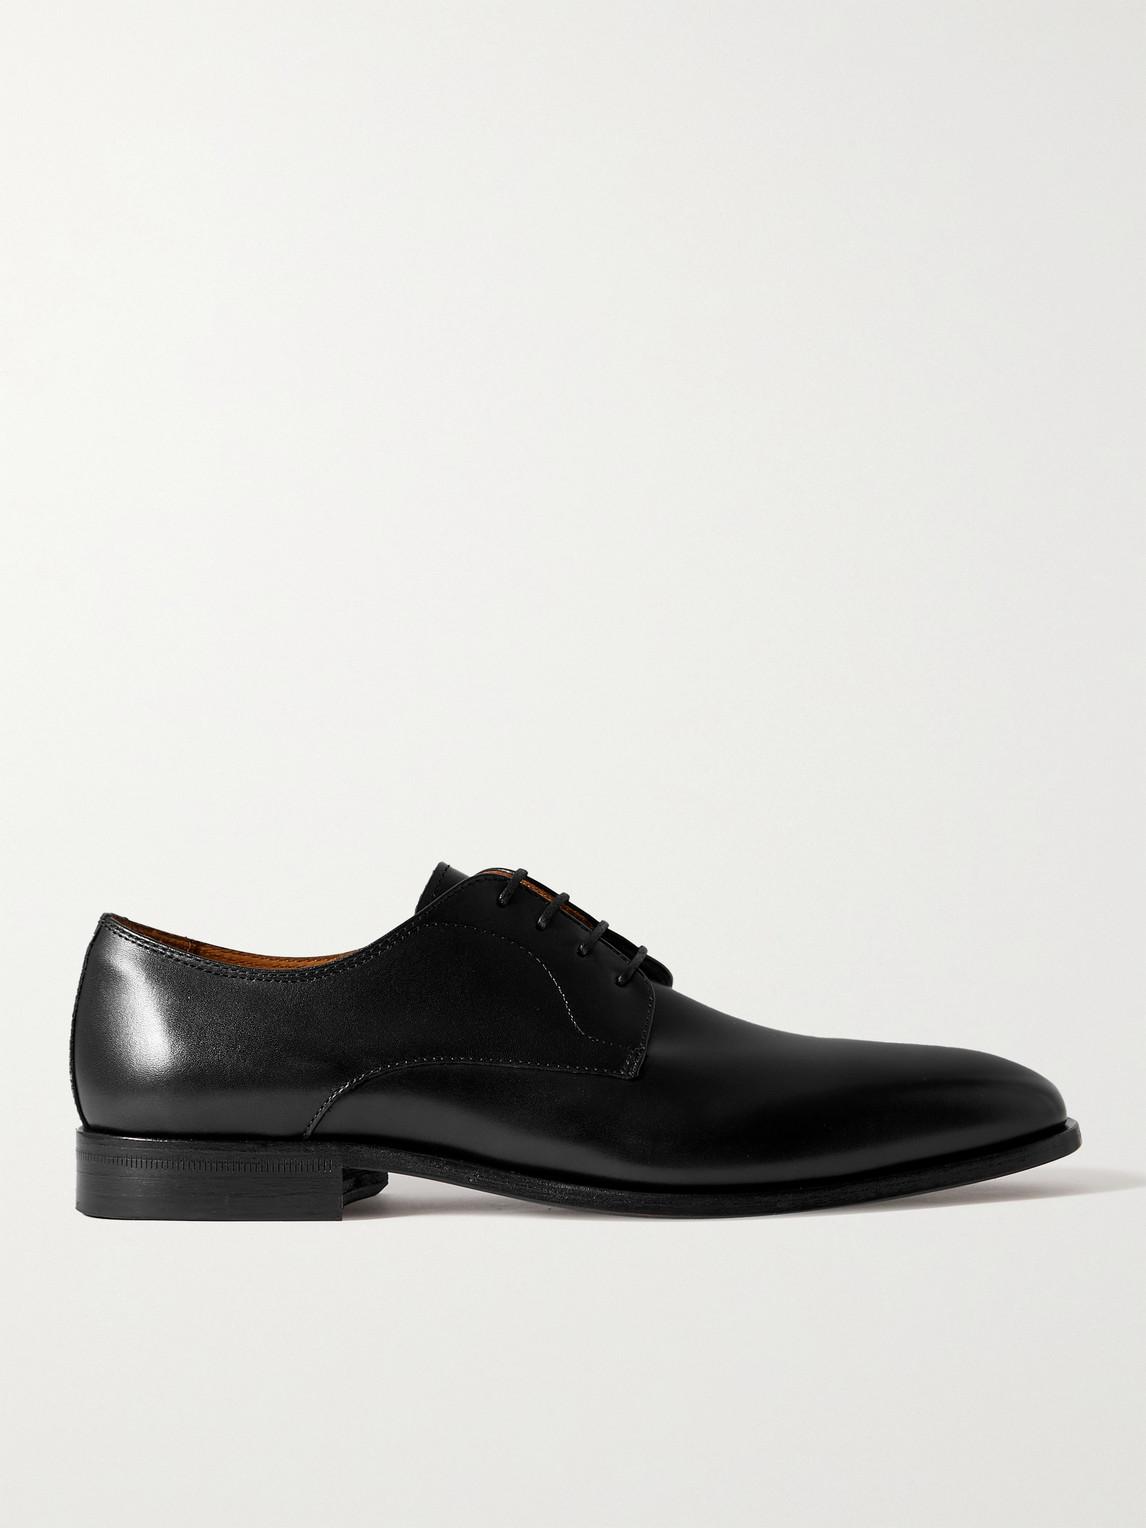 Hugo Boss Lisbon Leather Derby Shoes In Black